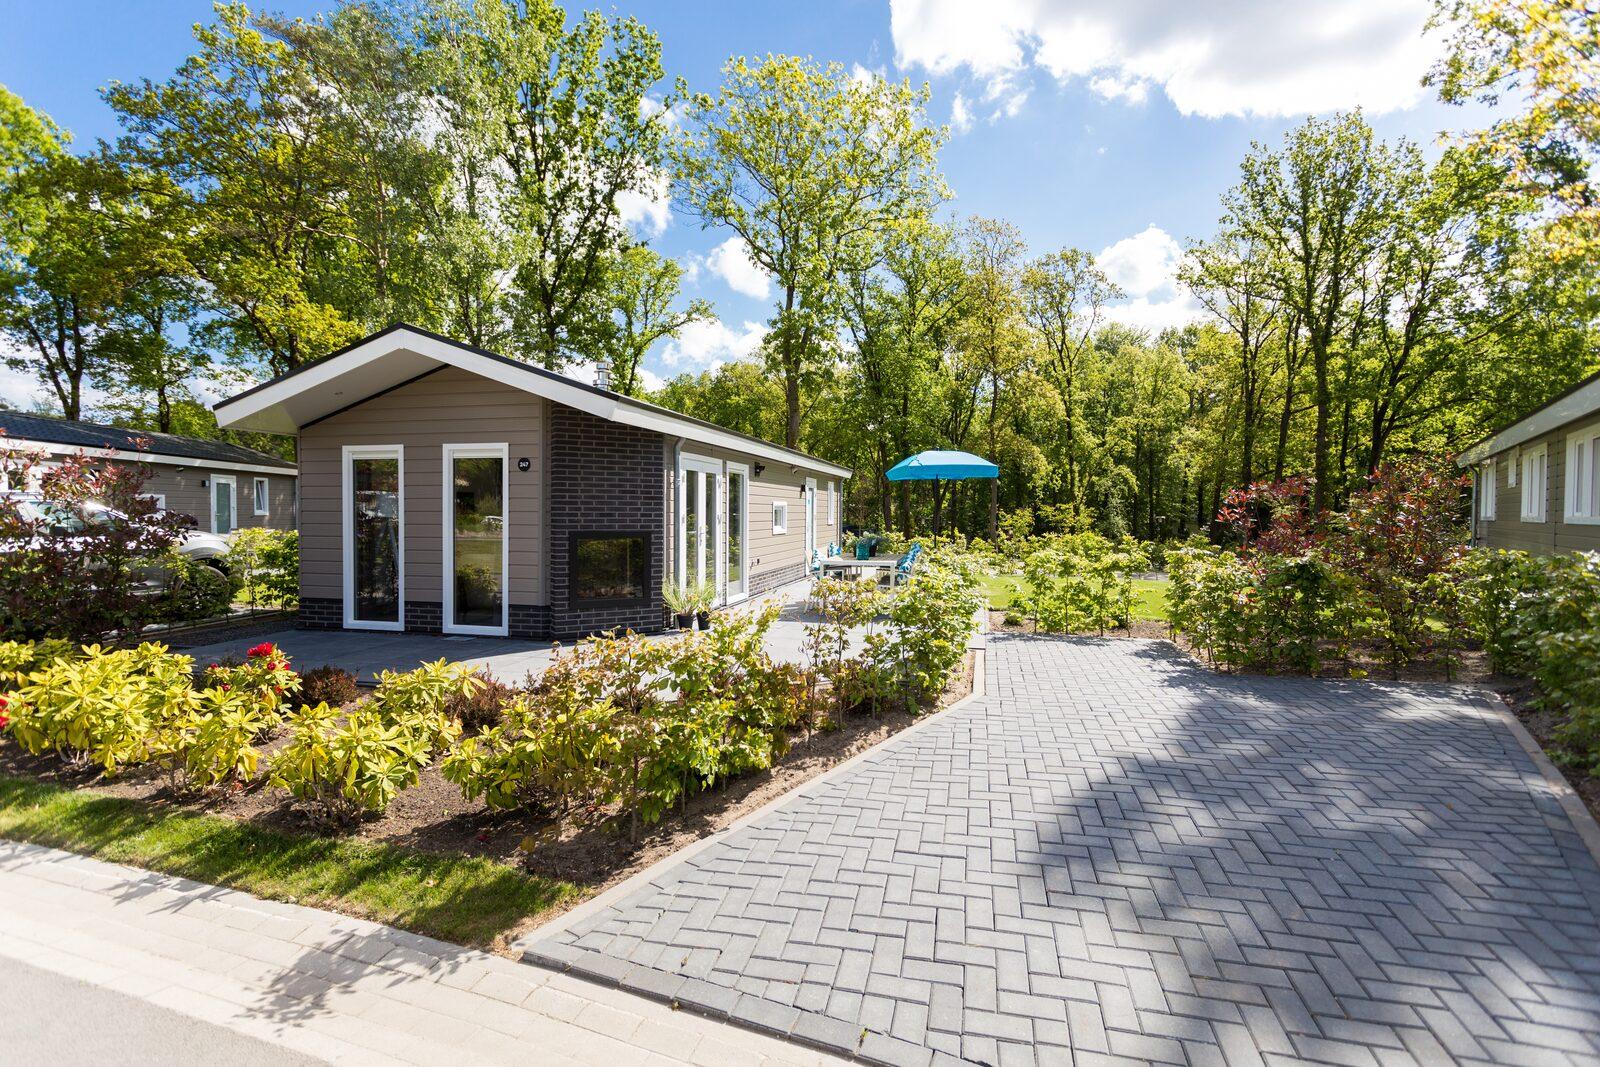 Buy a summer cottage